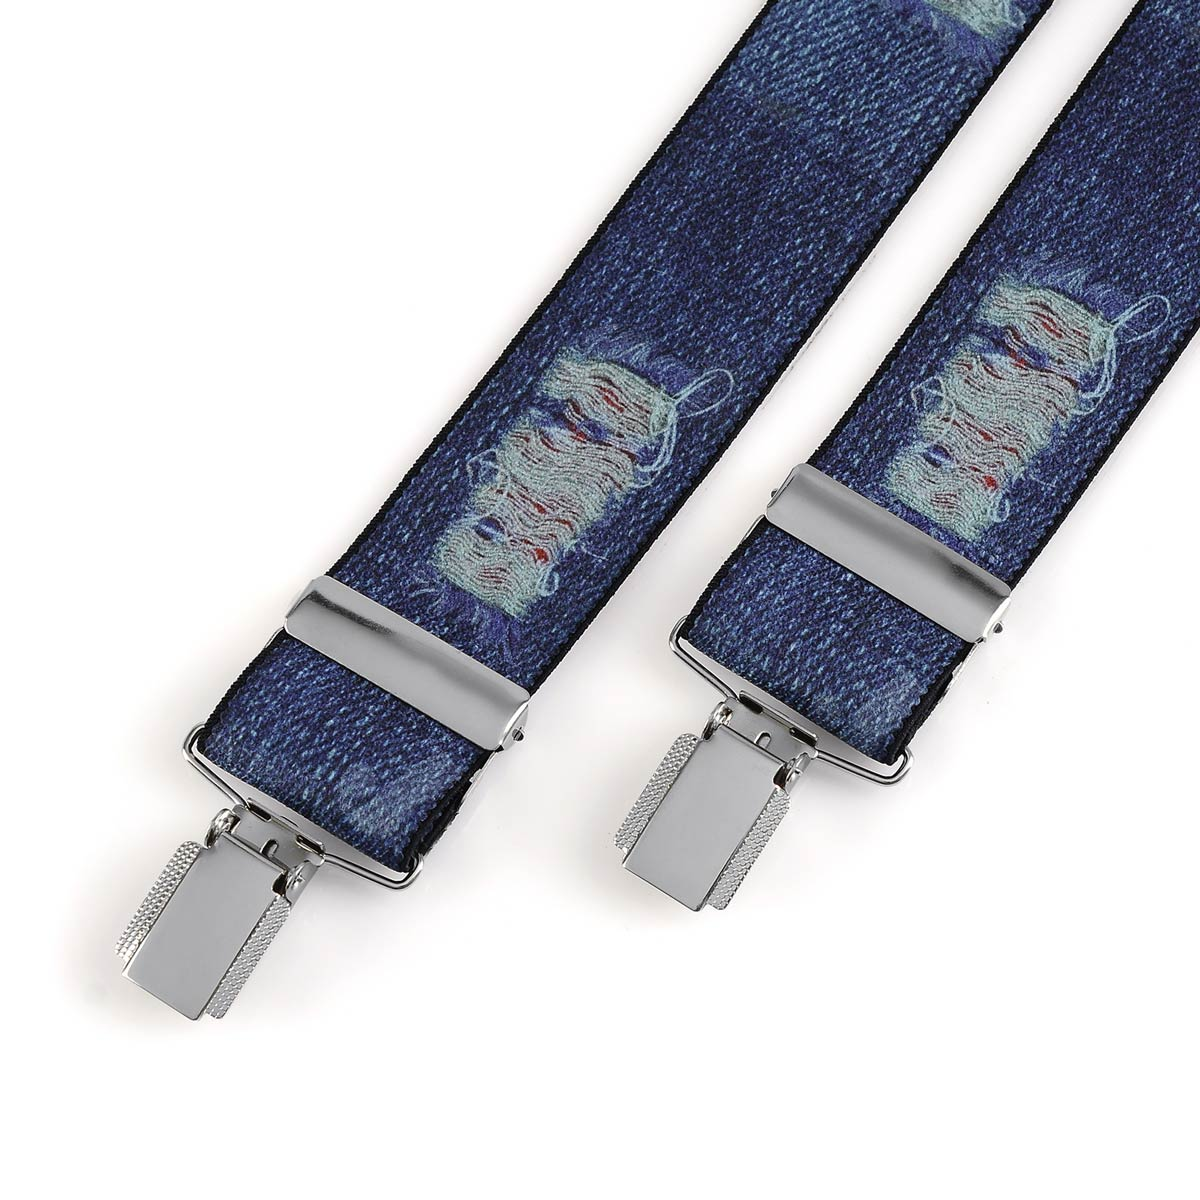 BT-00222_A12-1--_Bretelles-jean-dechire-bleu